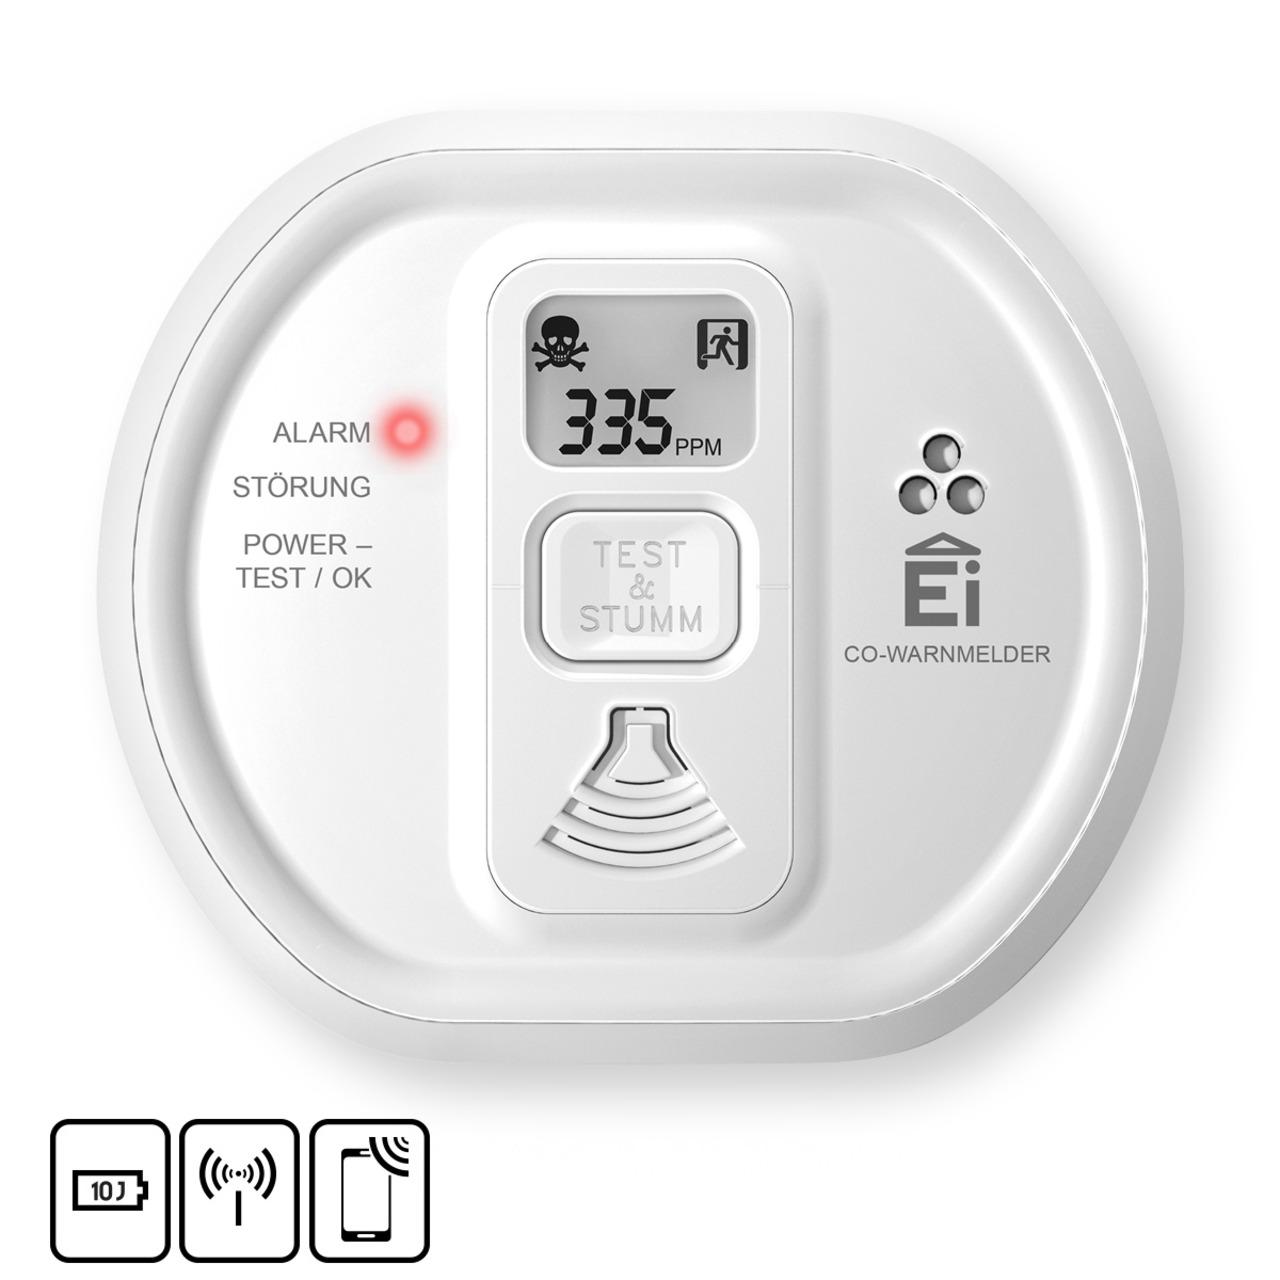 Ei Electronics Kohlenmonoxidwarnmelder Ei208iDW mit Display - AudioLINK- i-serie- 10 Jahres-Batterie